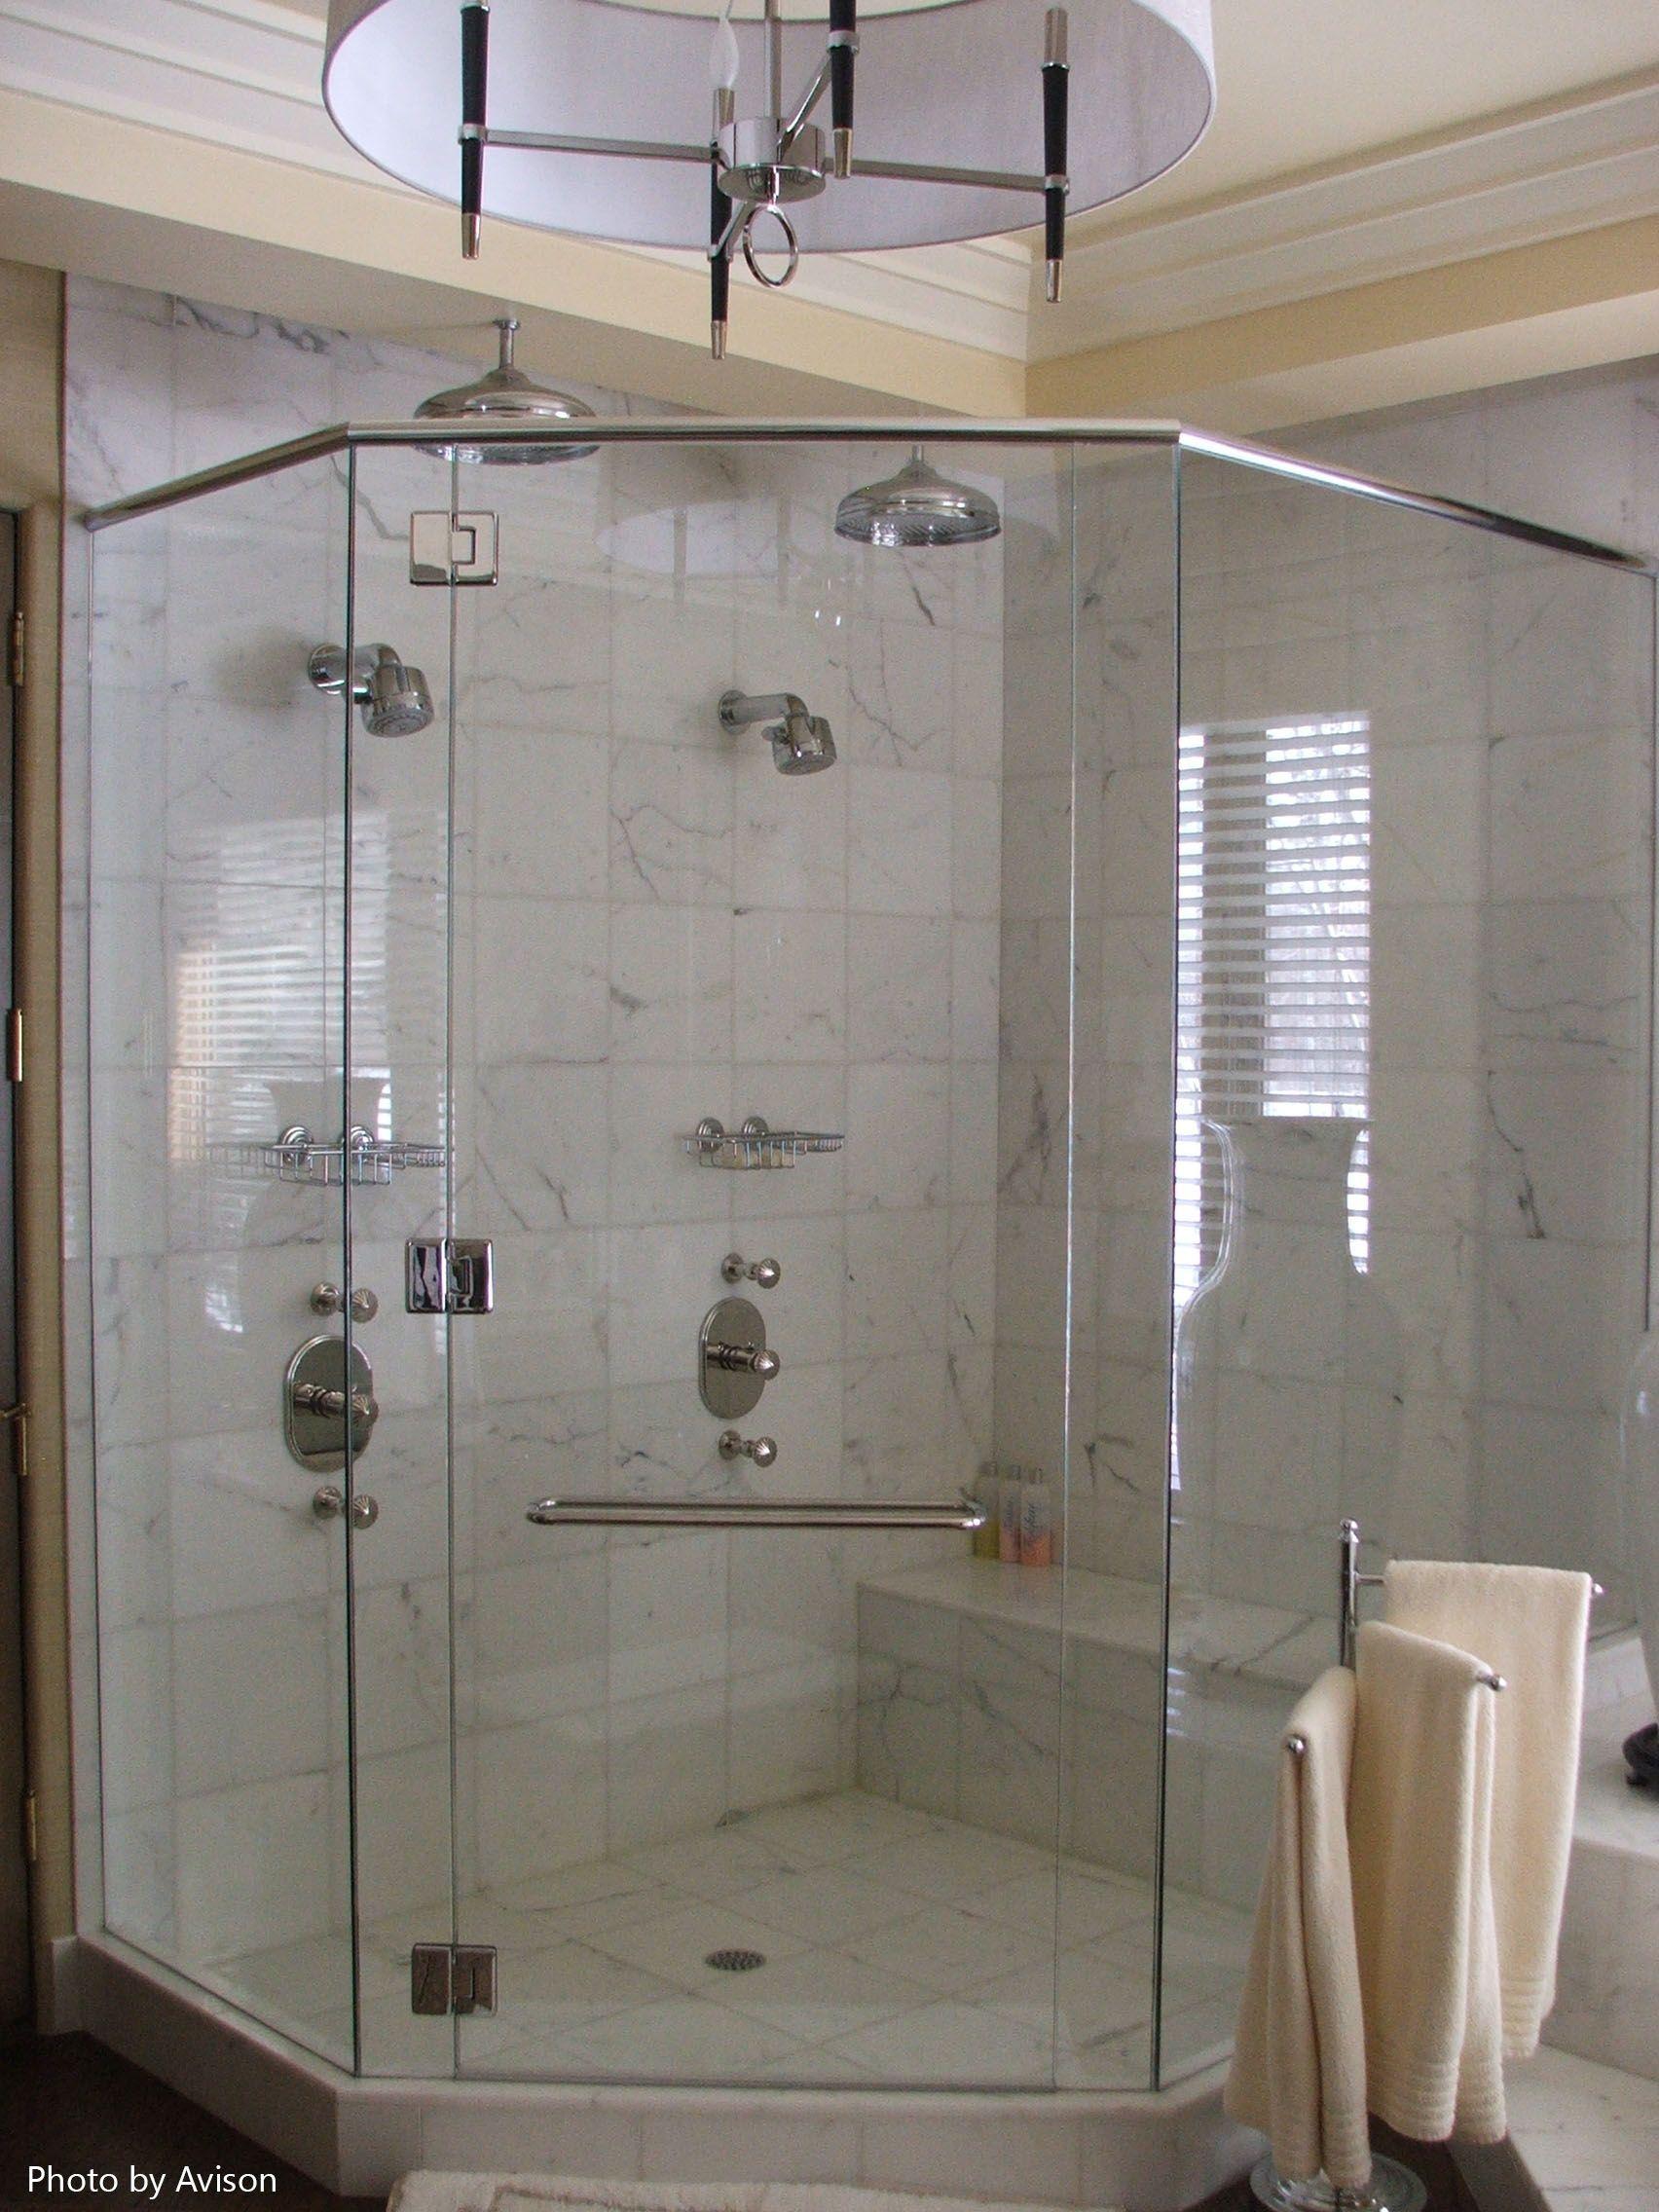 2020 Bathroom Remodel Cost Average Cost Of Bathroom Remodel Renovations Bathrooms Remodel Bathroom Remodel Cost Bathroom Renovation Cost